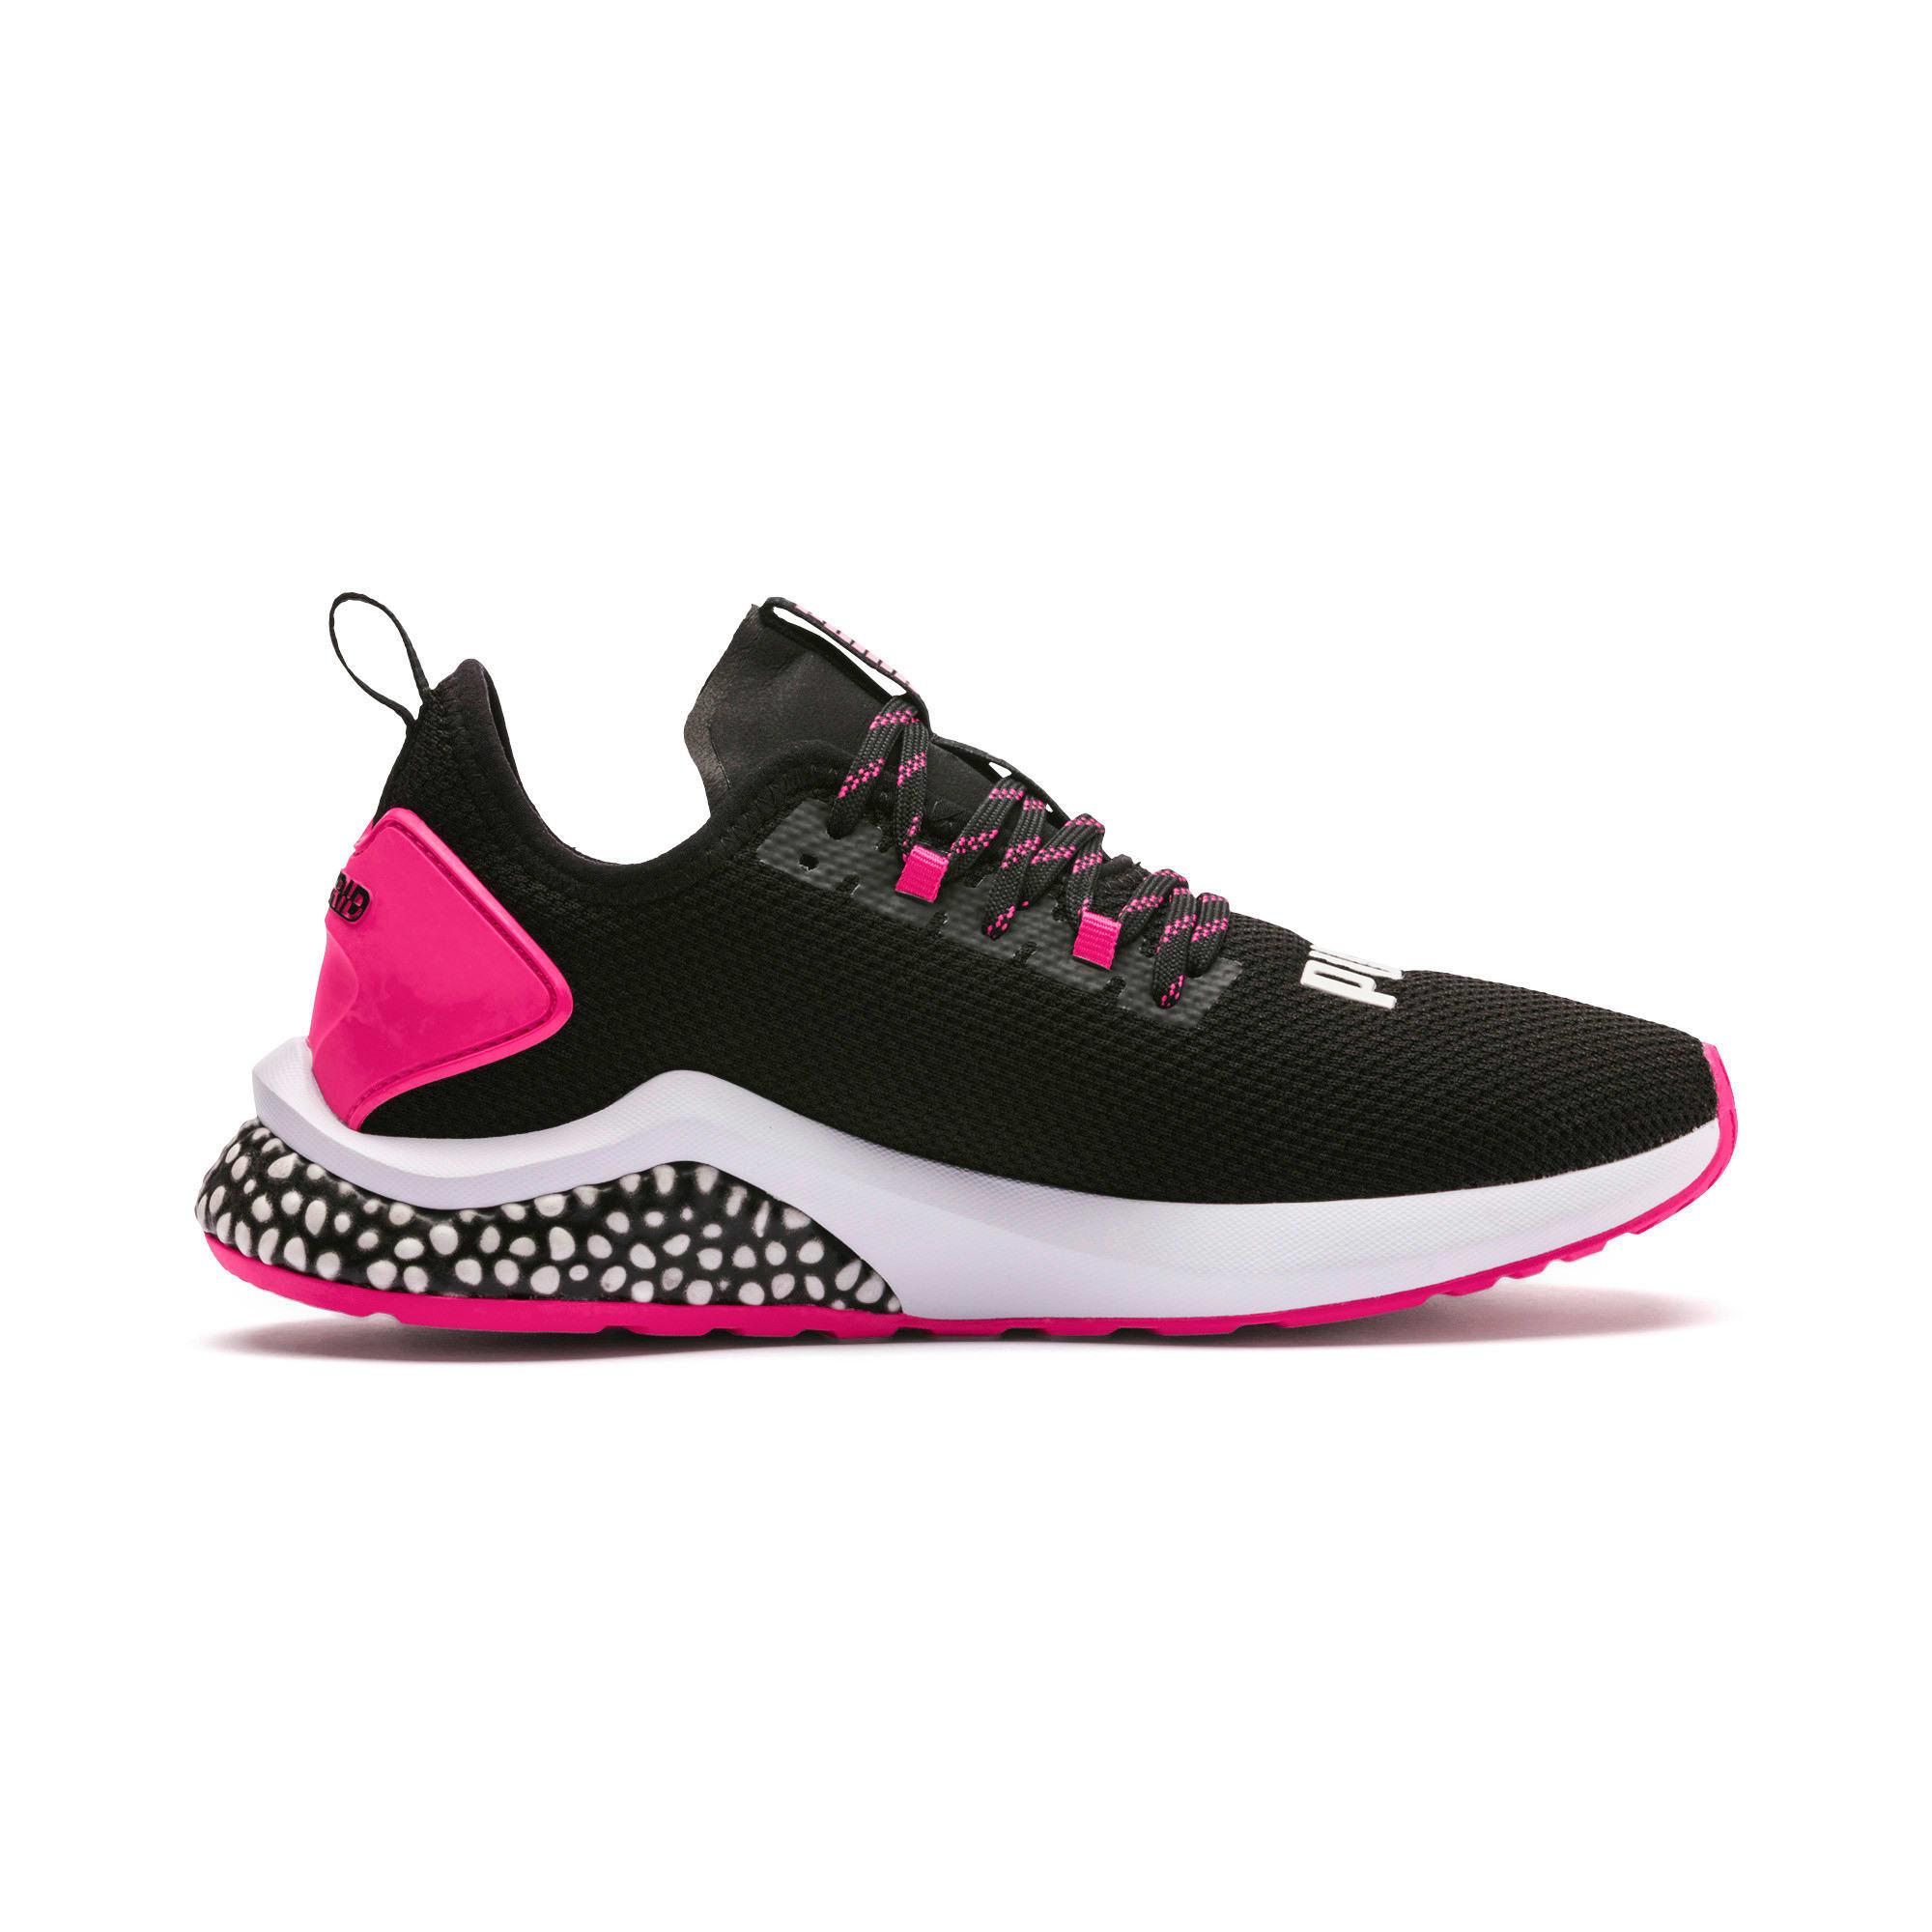 Thumbnail 6 of HYBRID NX Women's Running Shoes, Puma Black-Fuchsia Purple, medium